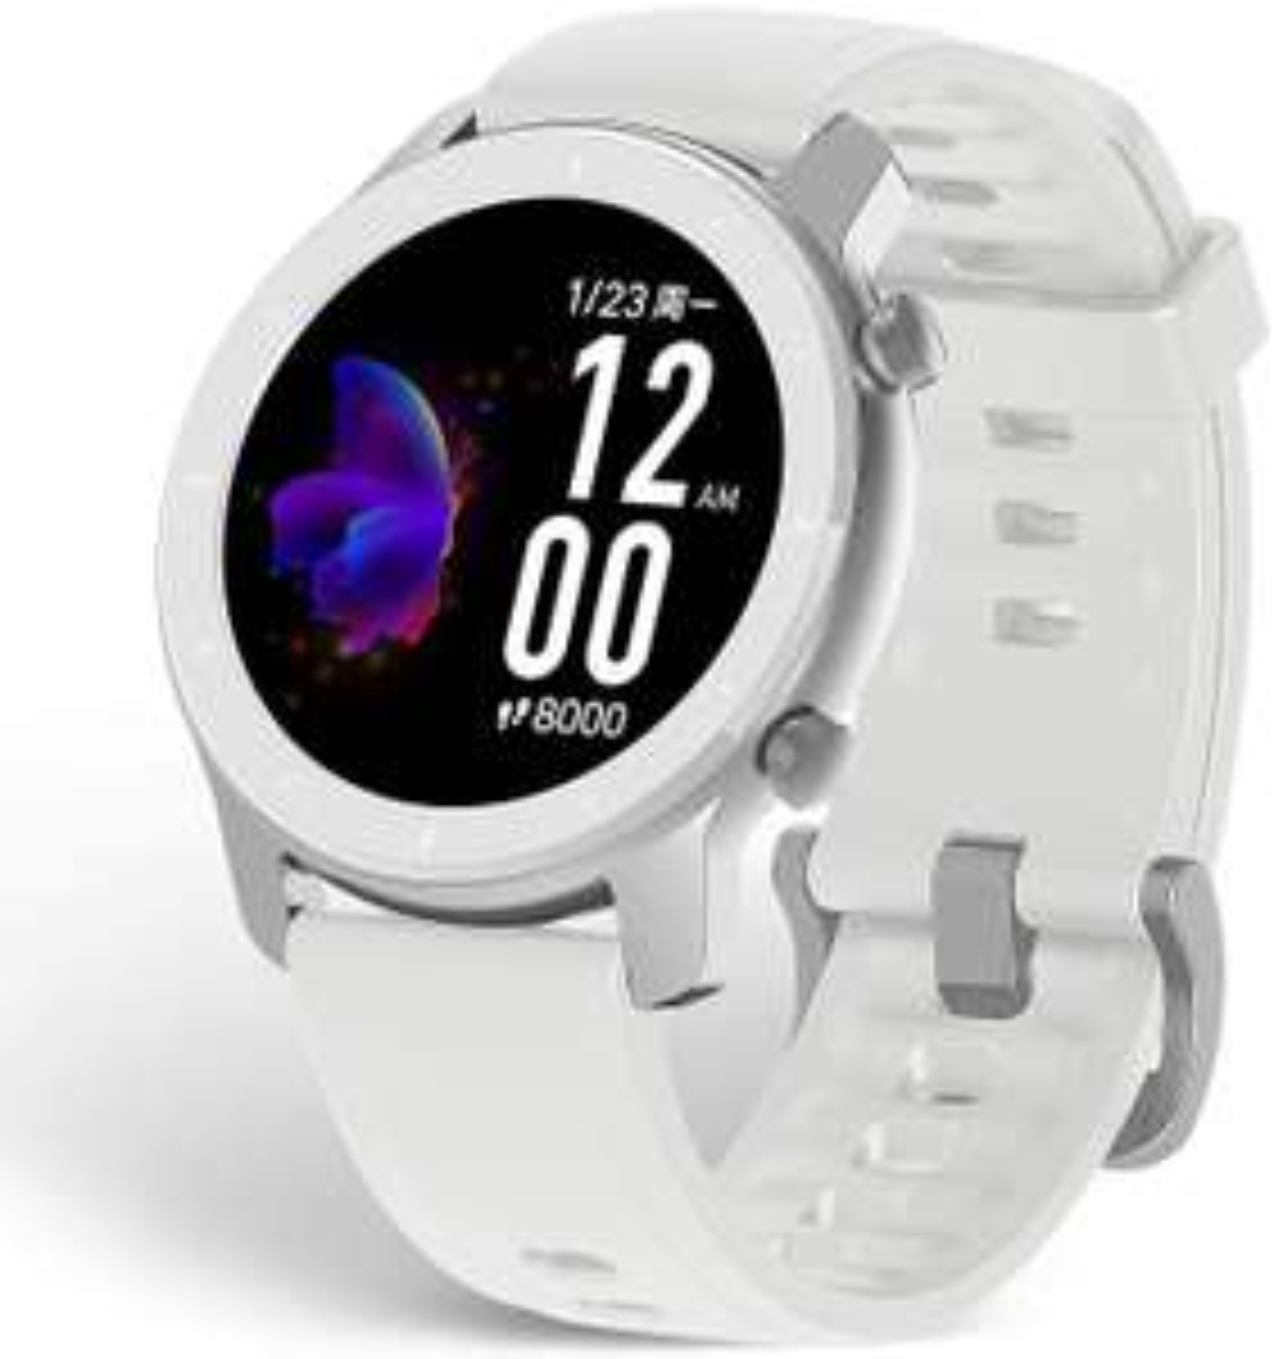 Amazfit Smartwatch GTR 42mm 1,2 Zoll Touch Control Farbdisplay Sportuhr Fitness Armbanduhr 5 ATM wasserdicht [Amazon]